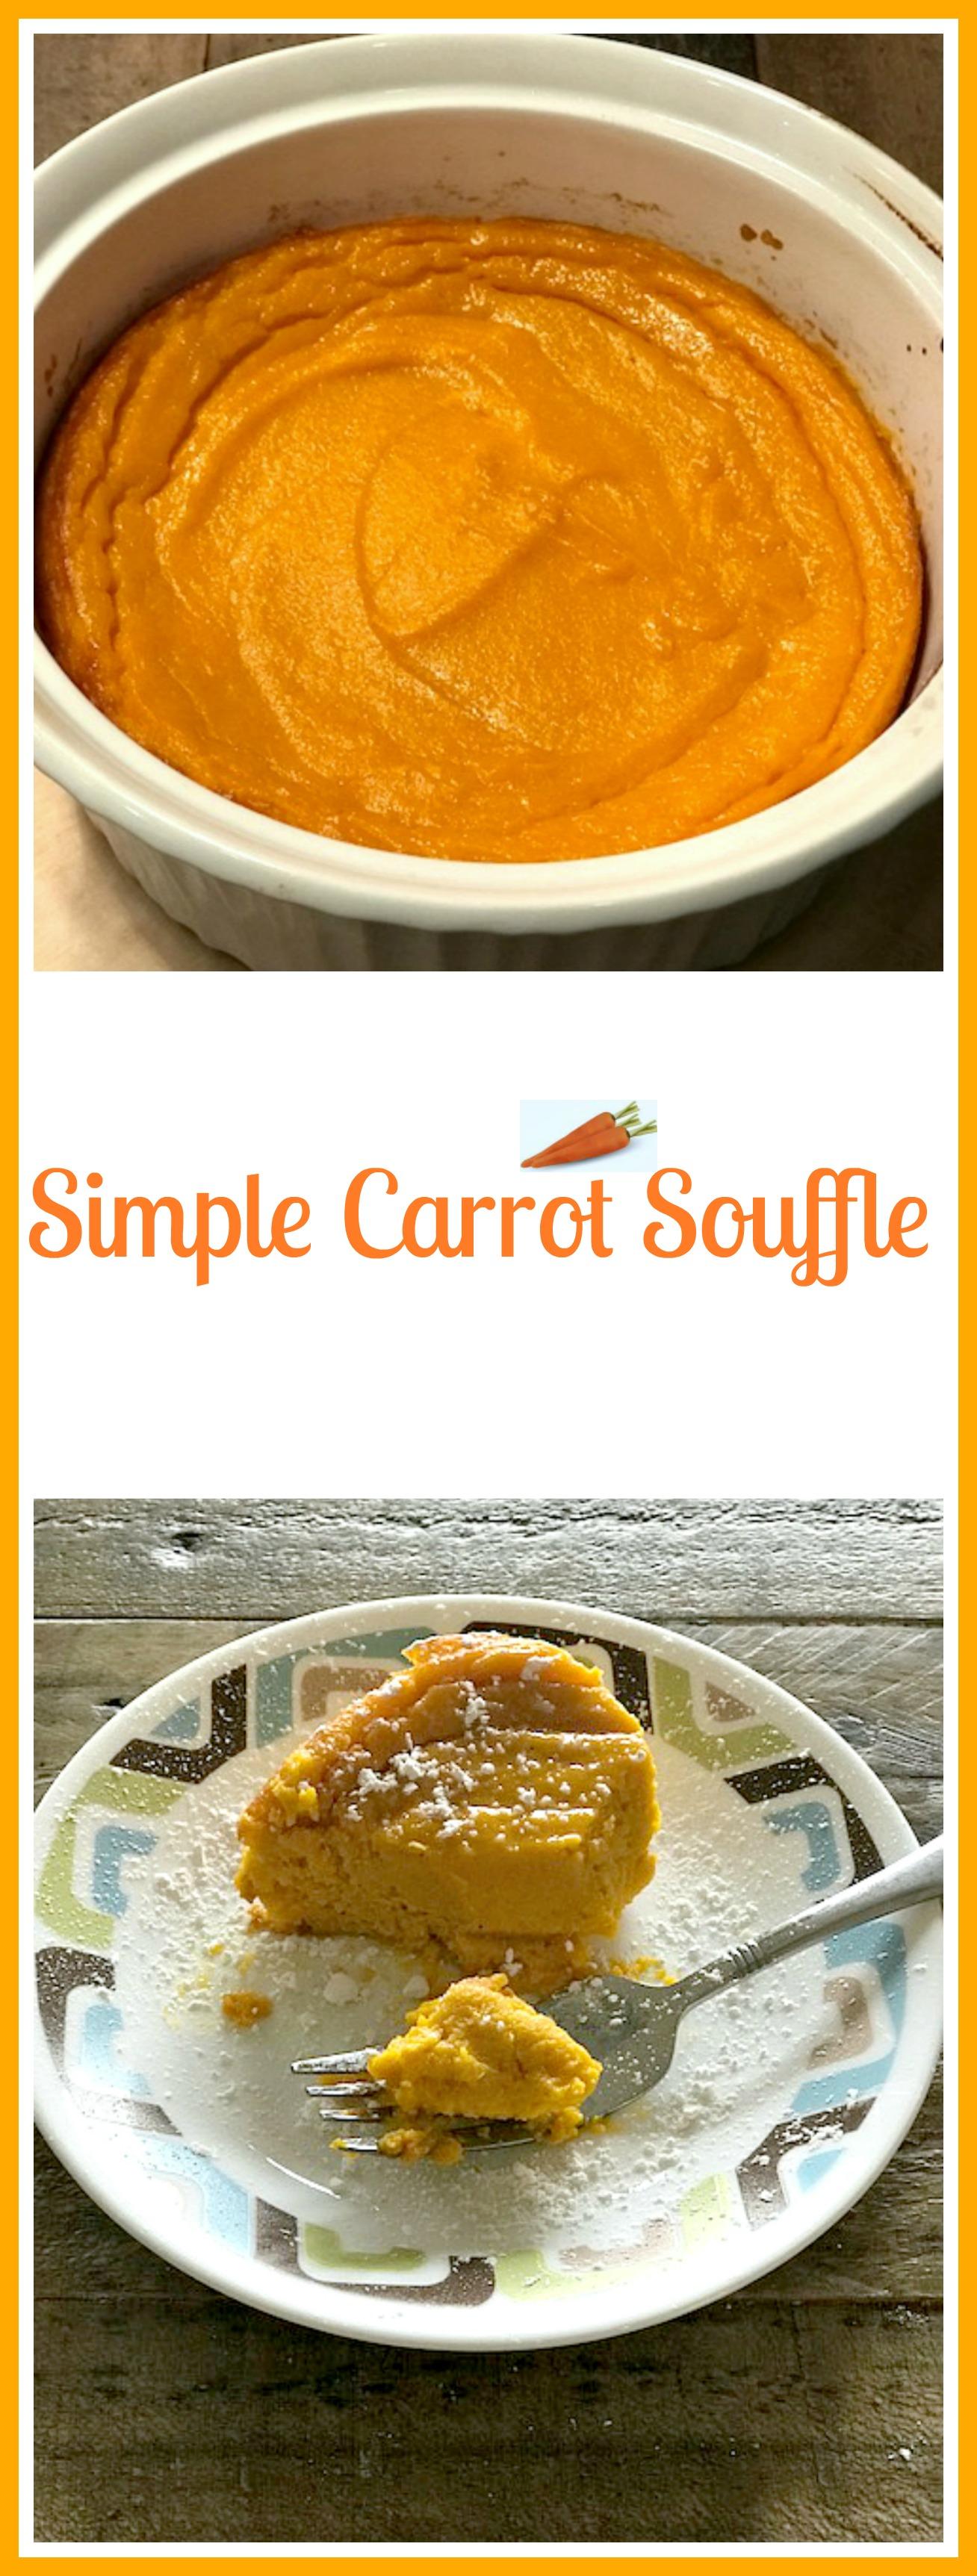 recipe: carrot souffle savory [28]